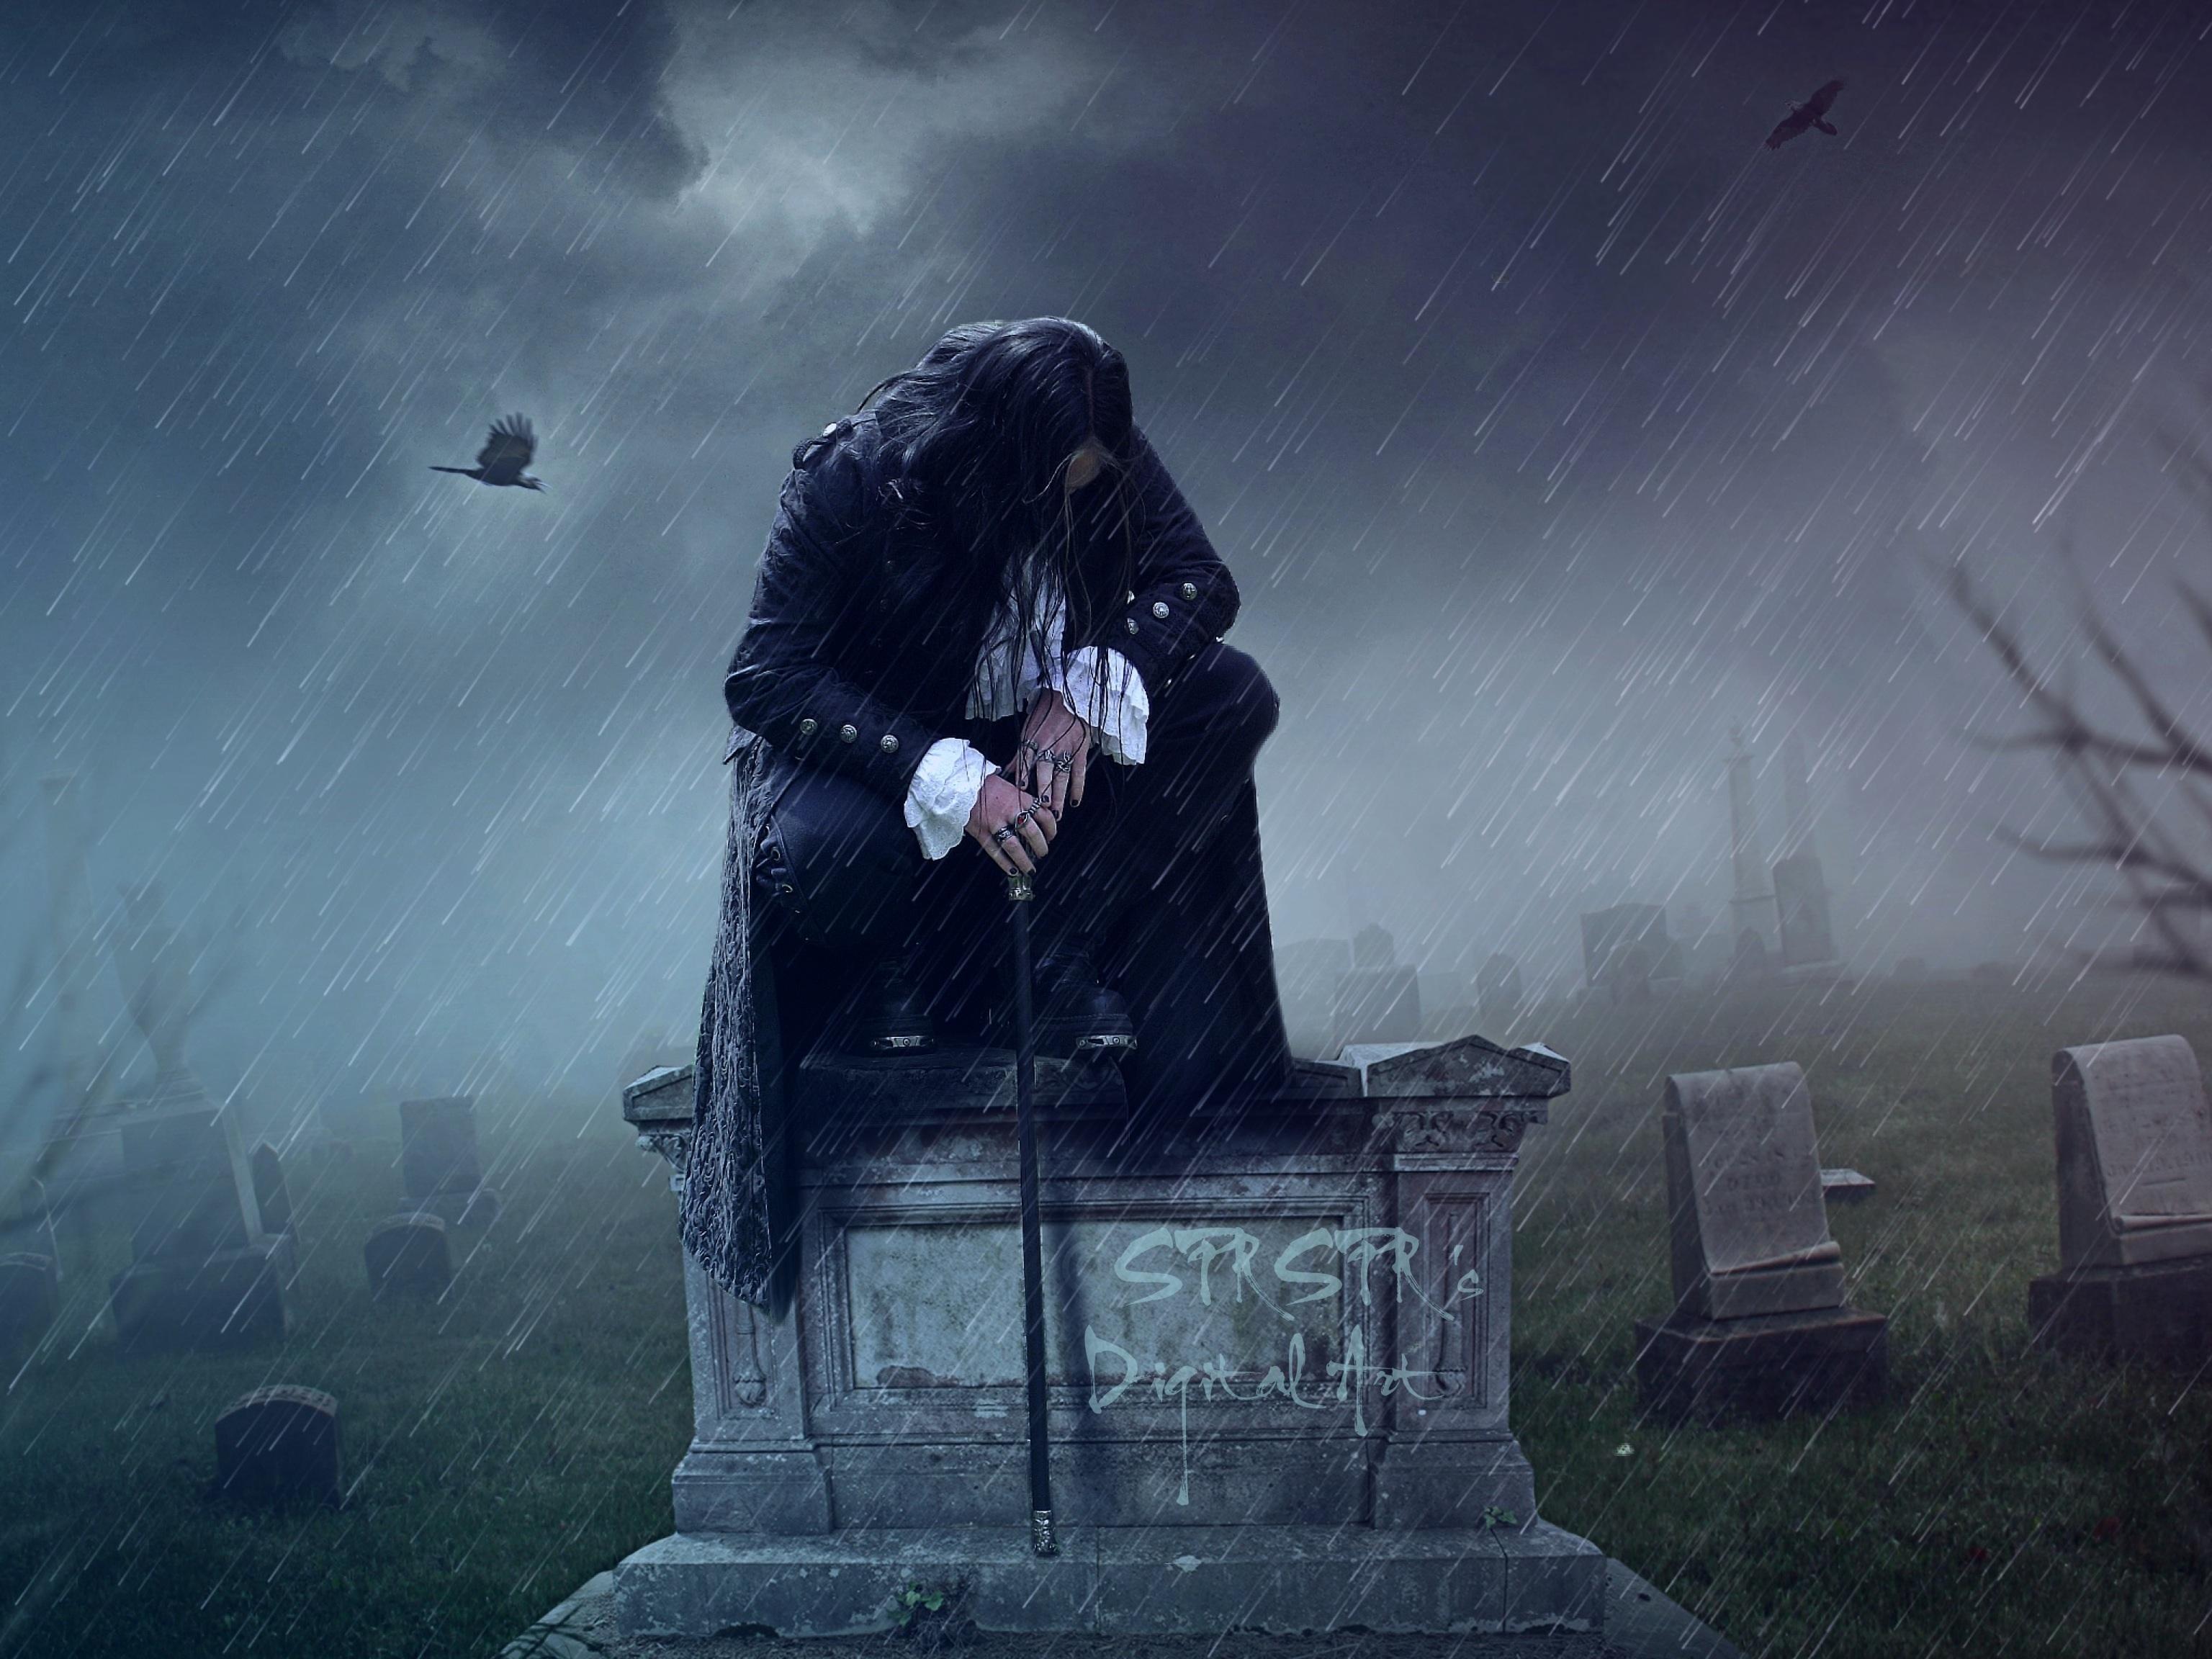 Alone in the rain by SPRSPRsDigitalArt on DeviantArt